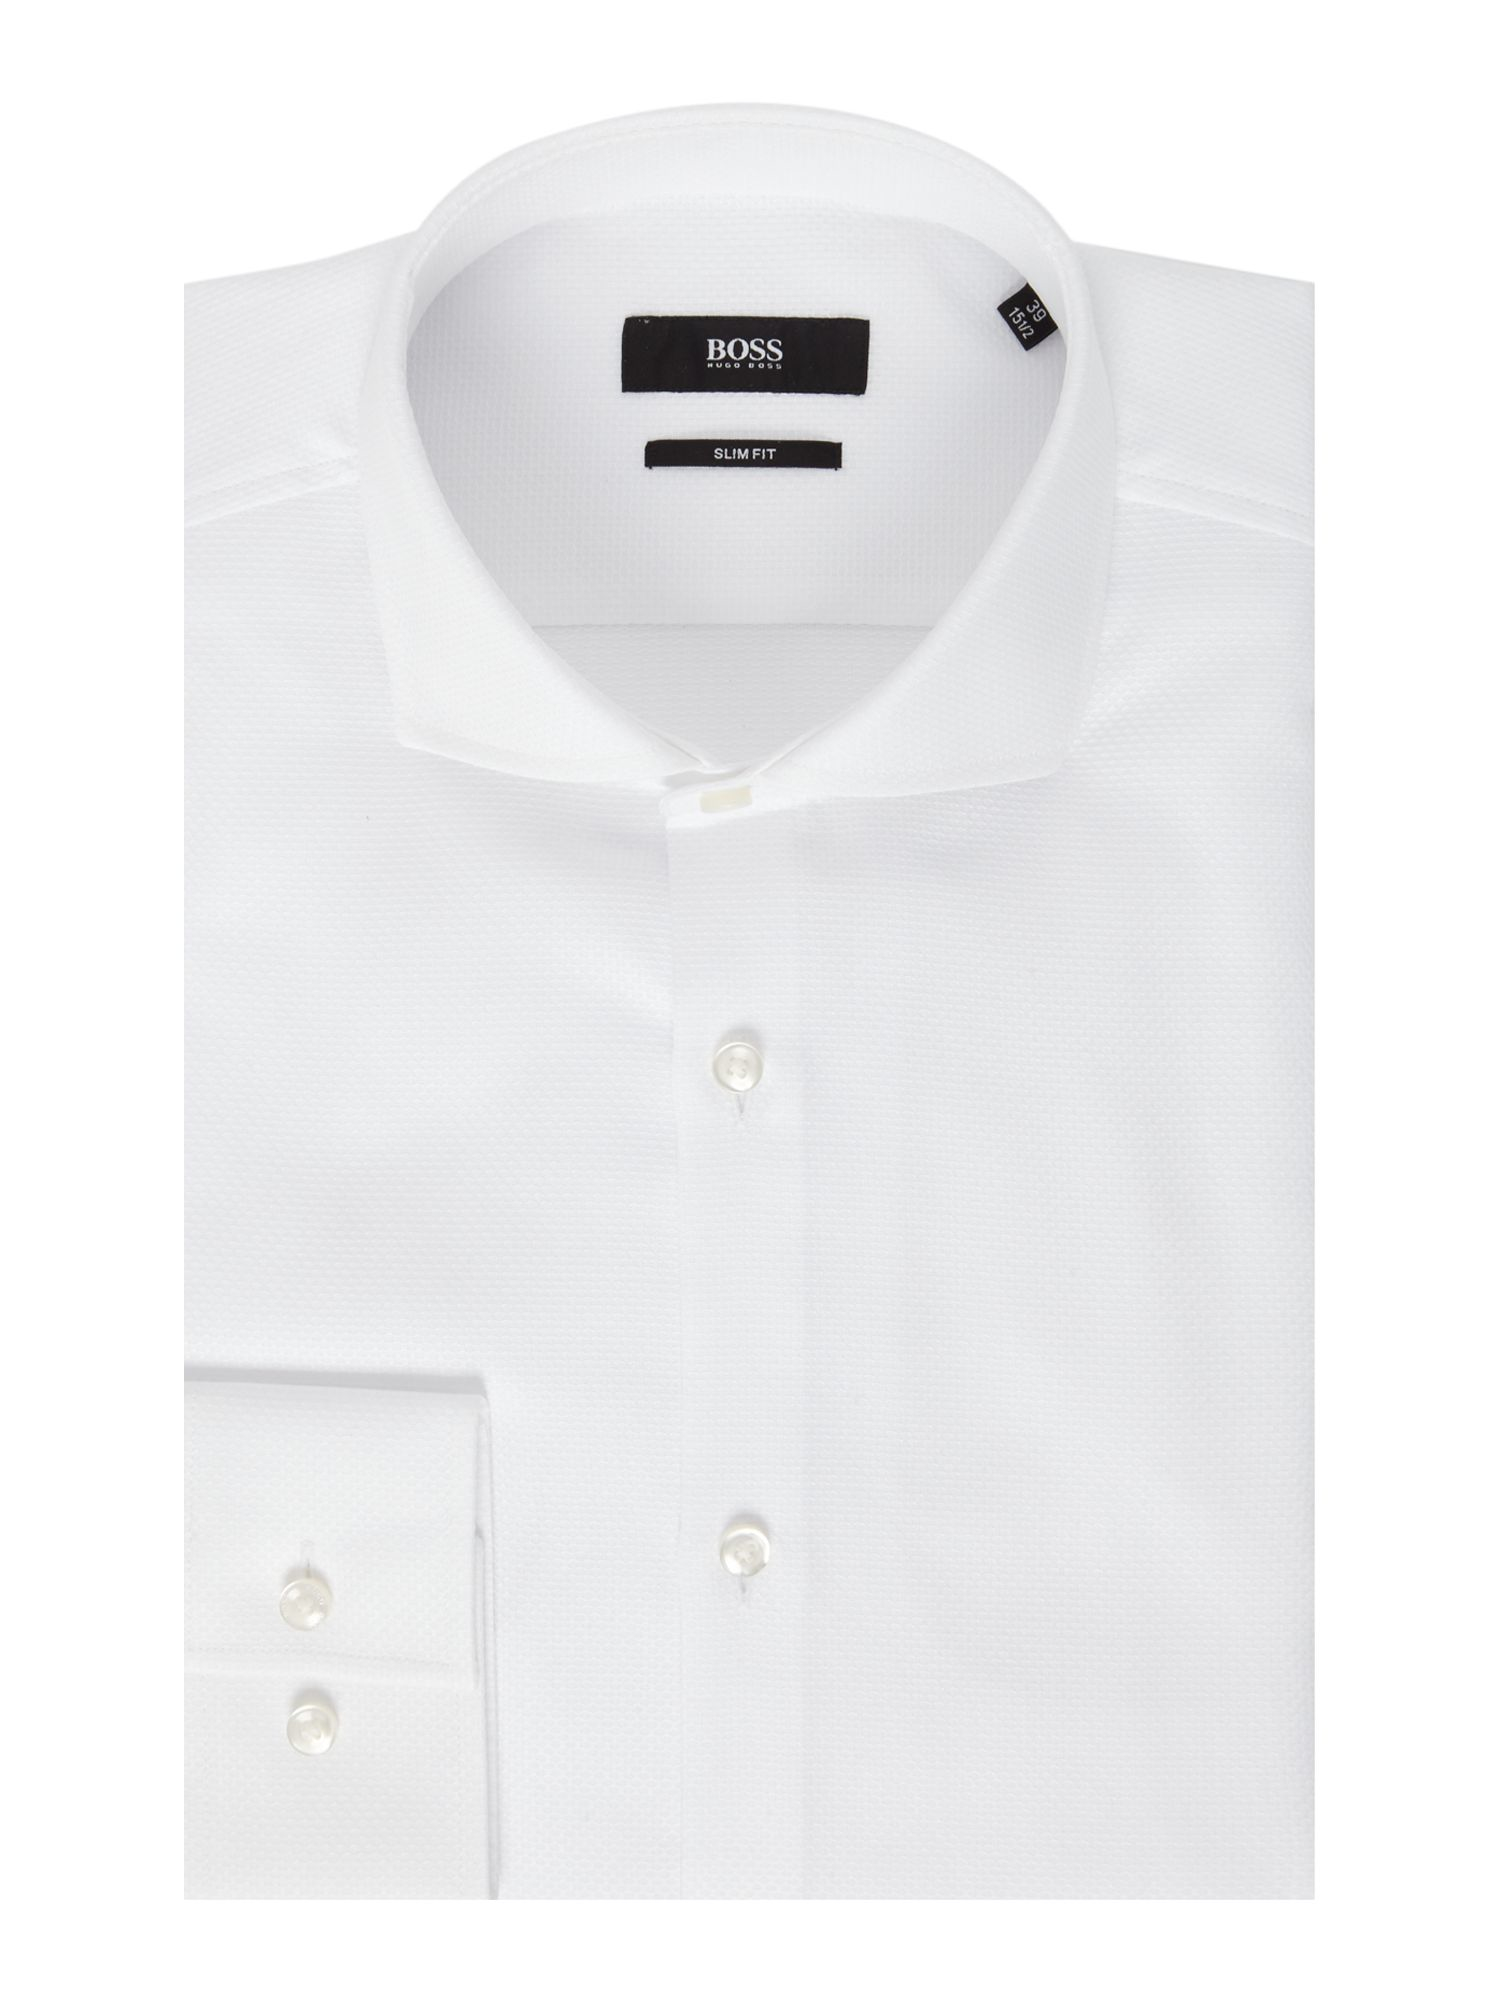 Boss slim fit jason shirt in whiter jacquard in white for for Hugo boss jason shirt